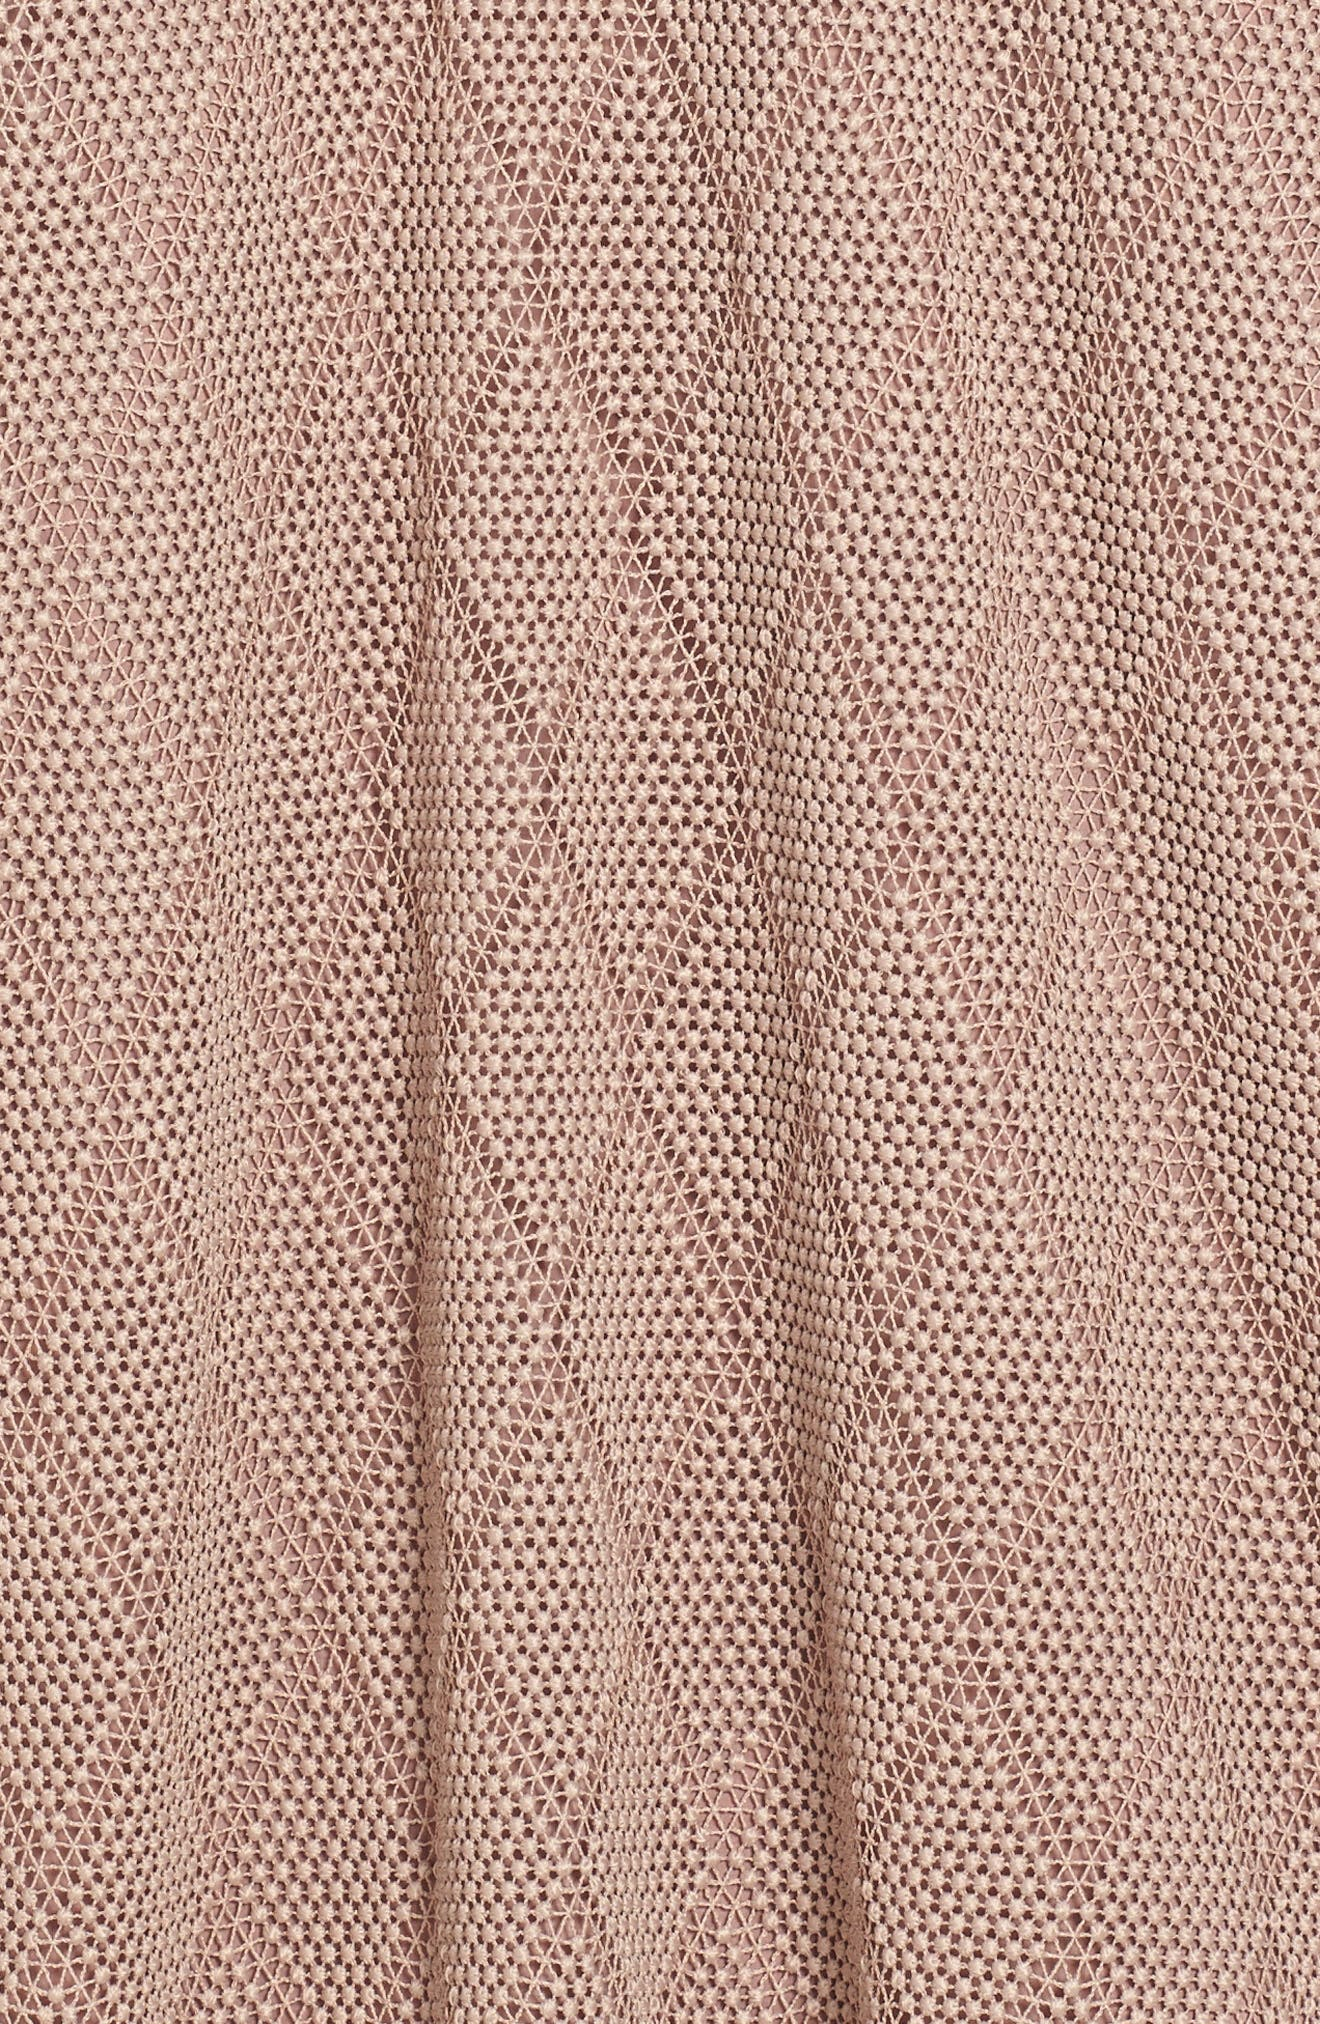 Sabrina Lace Dress,                             Alternate thumbnail 3, color,                             264